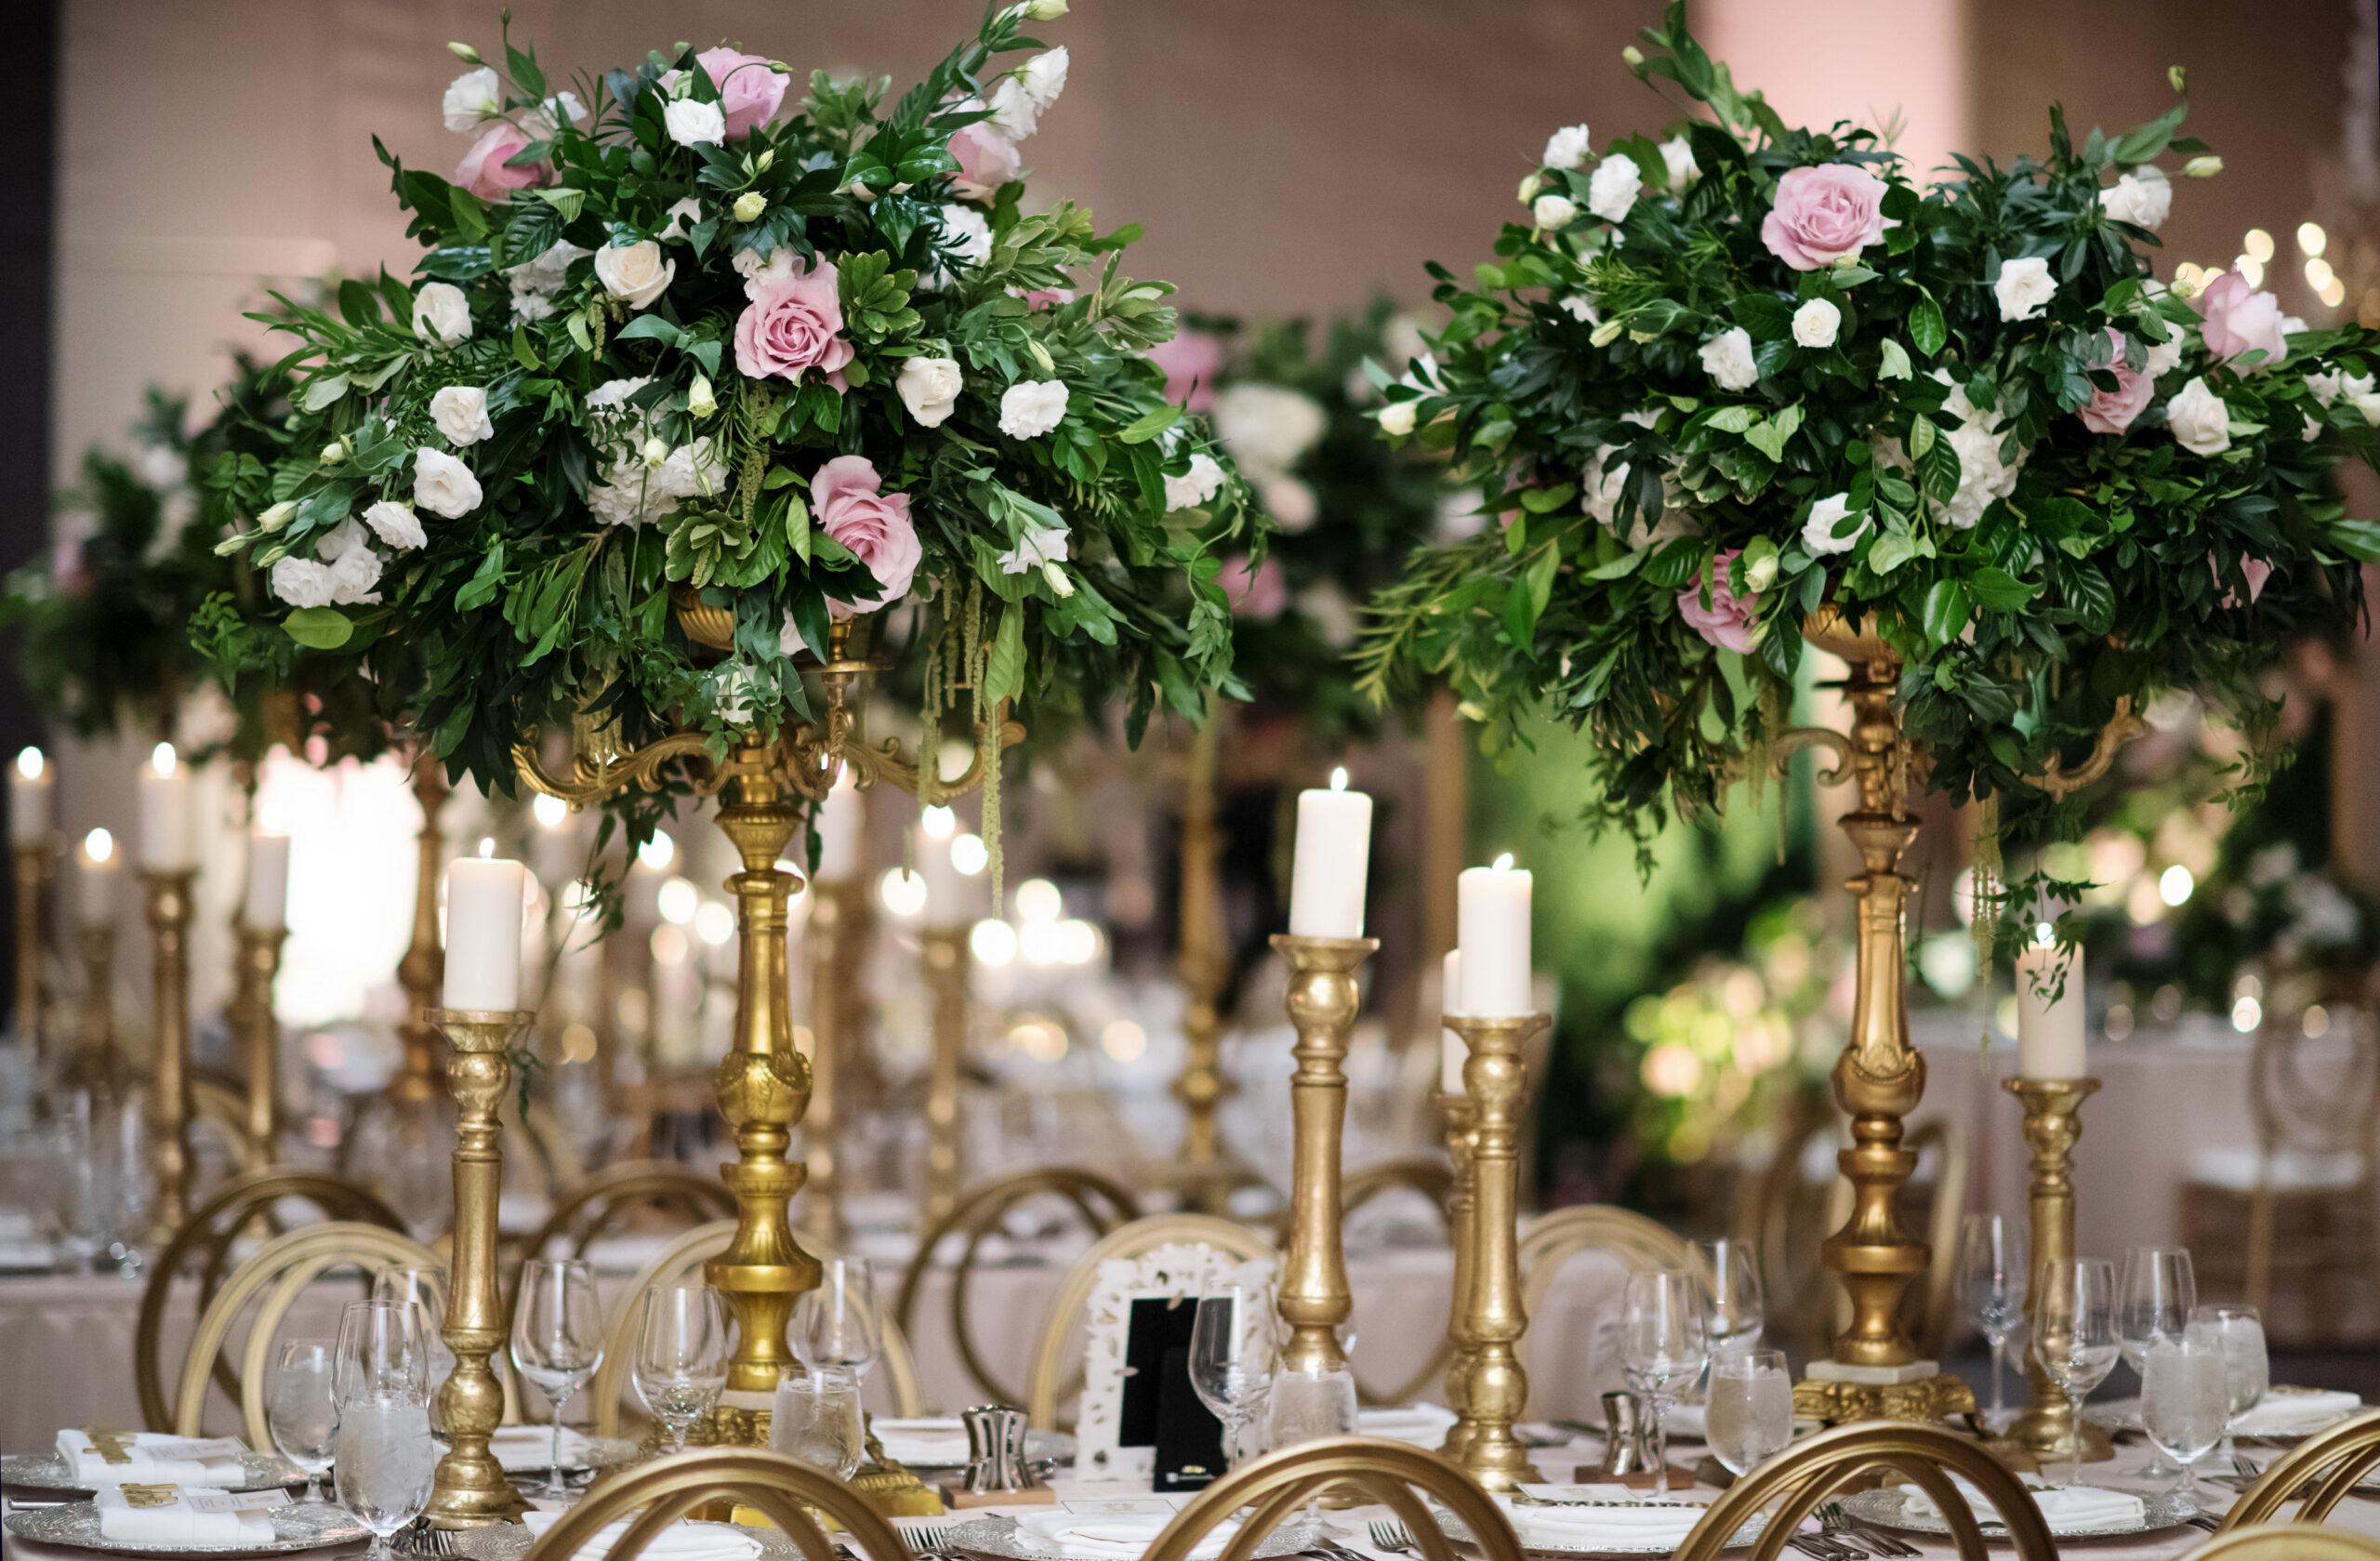 https://secureservercdn.net/45.40.145.151/kgq.ab5.myftpupload.com/wp-content/uploads/2020/04/Sanam-Soroush-s-Wedding-wedluxe-submission-0090-scaled.jpg?time=1606414923